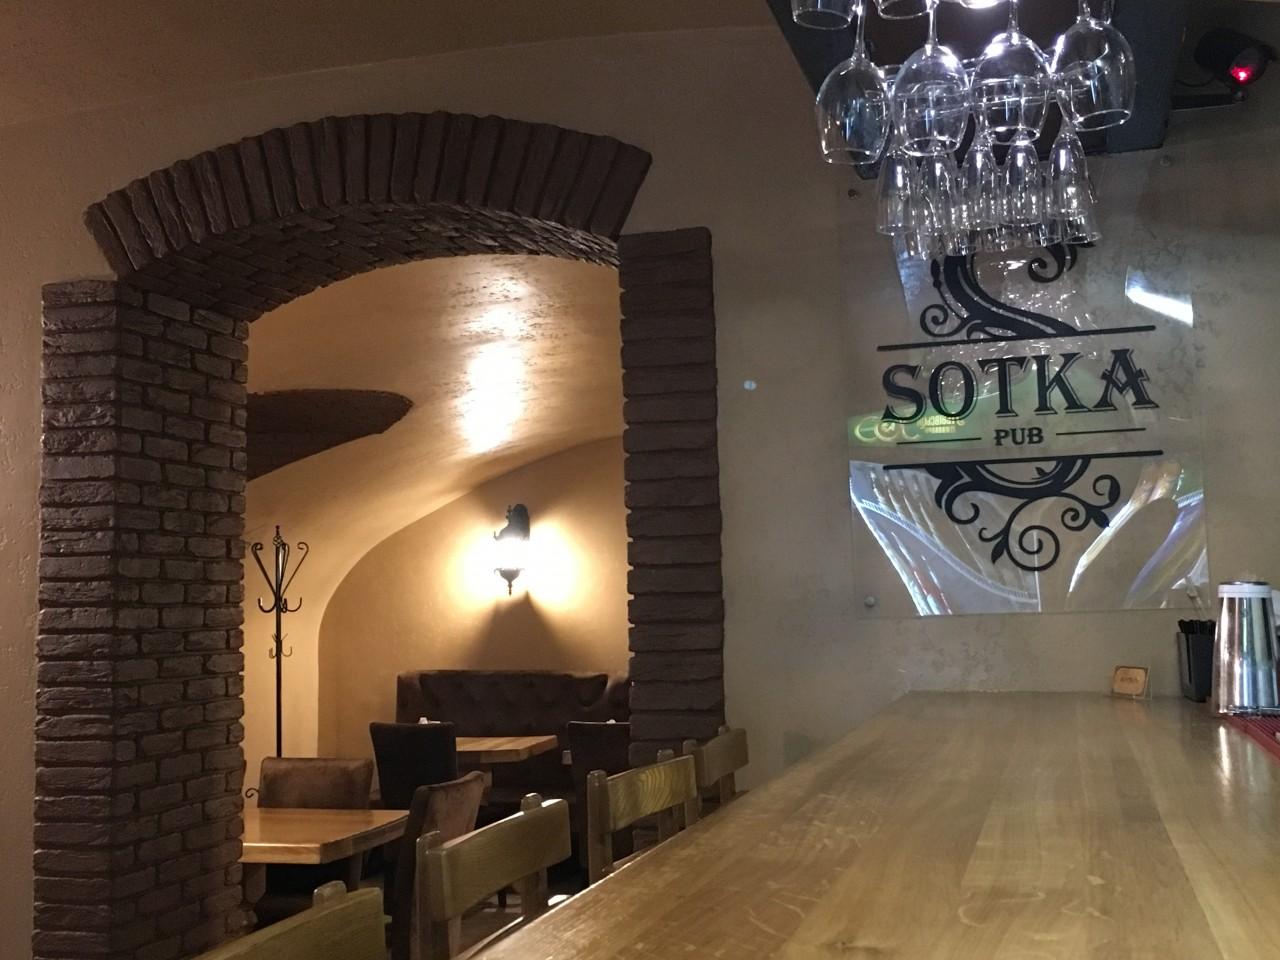 Sotka pub - фото 4